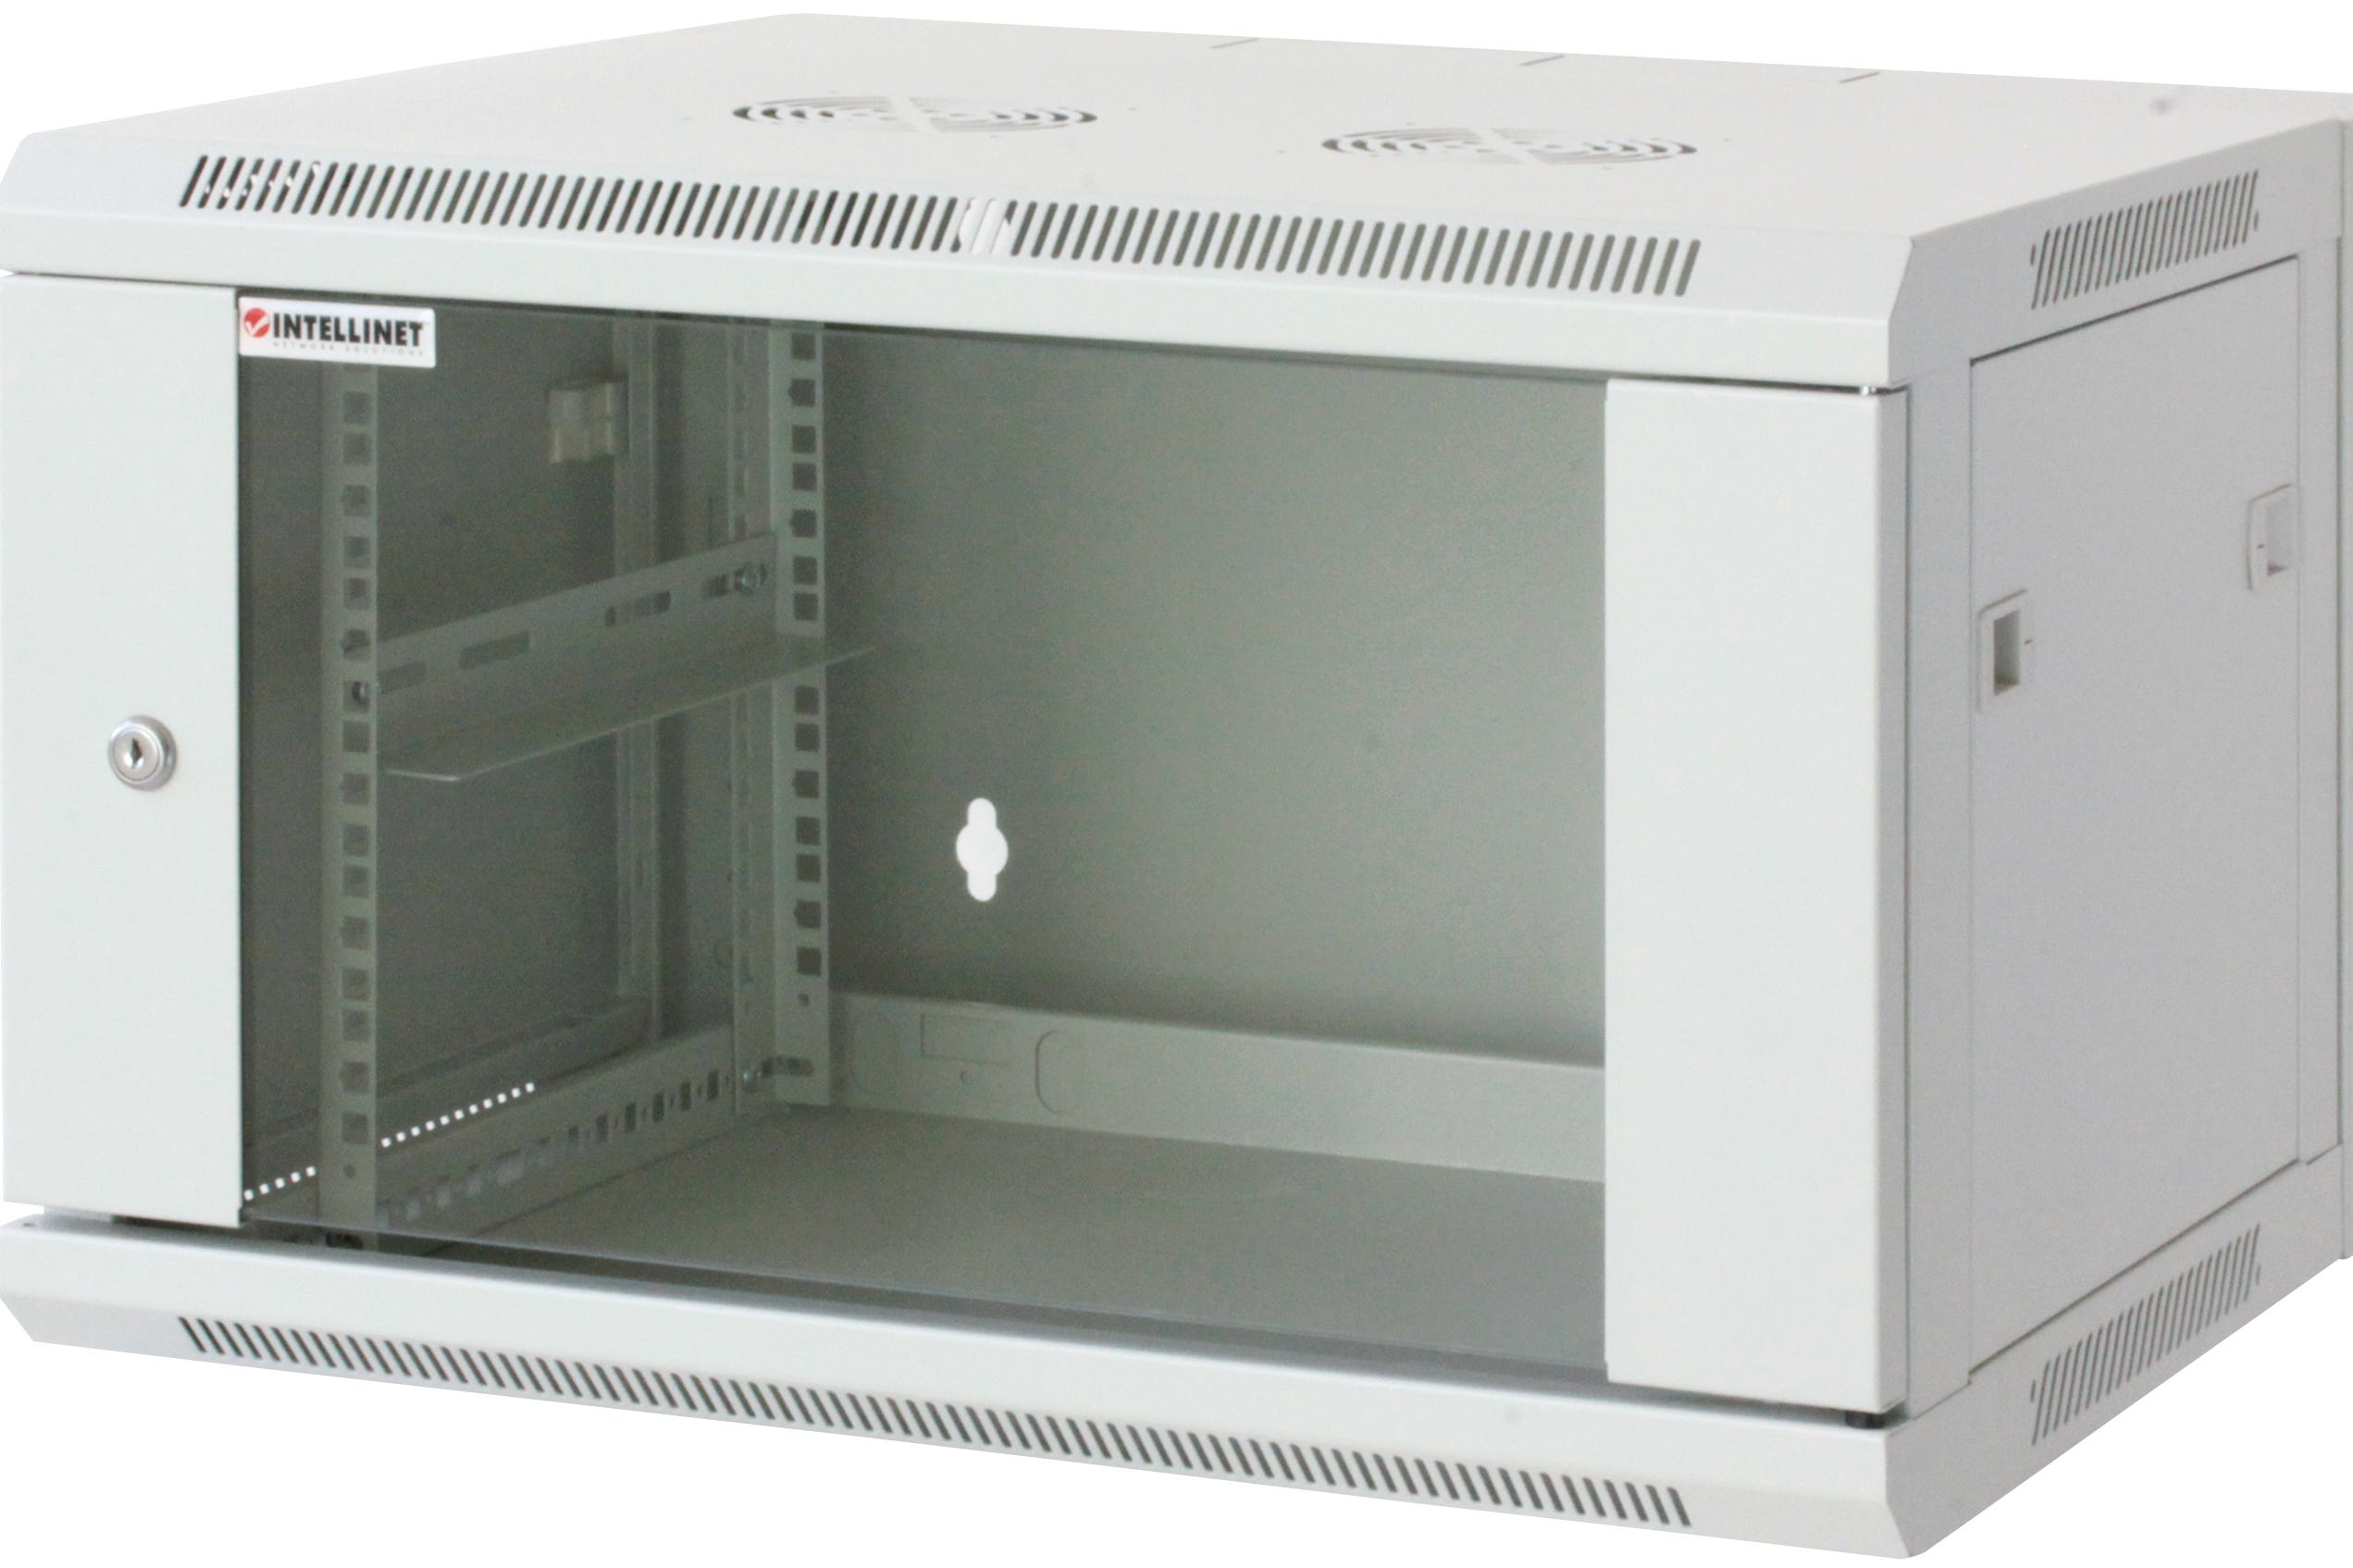 Intellinet 711920 - 12U - Wandmontiertes Regal - 60 kg - Grau - SPCC - Geschlossen